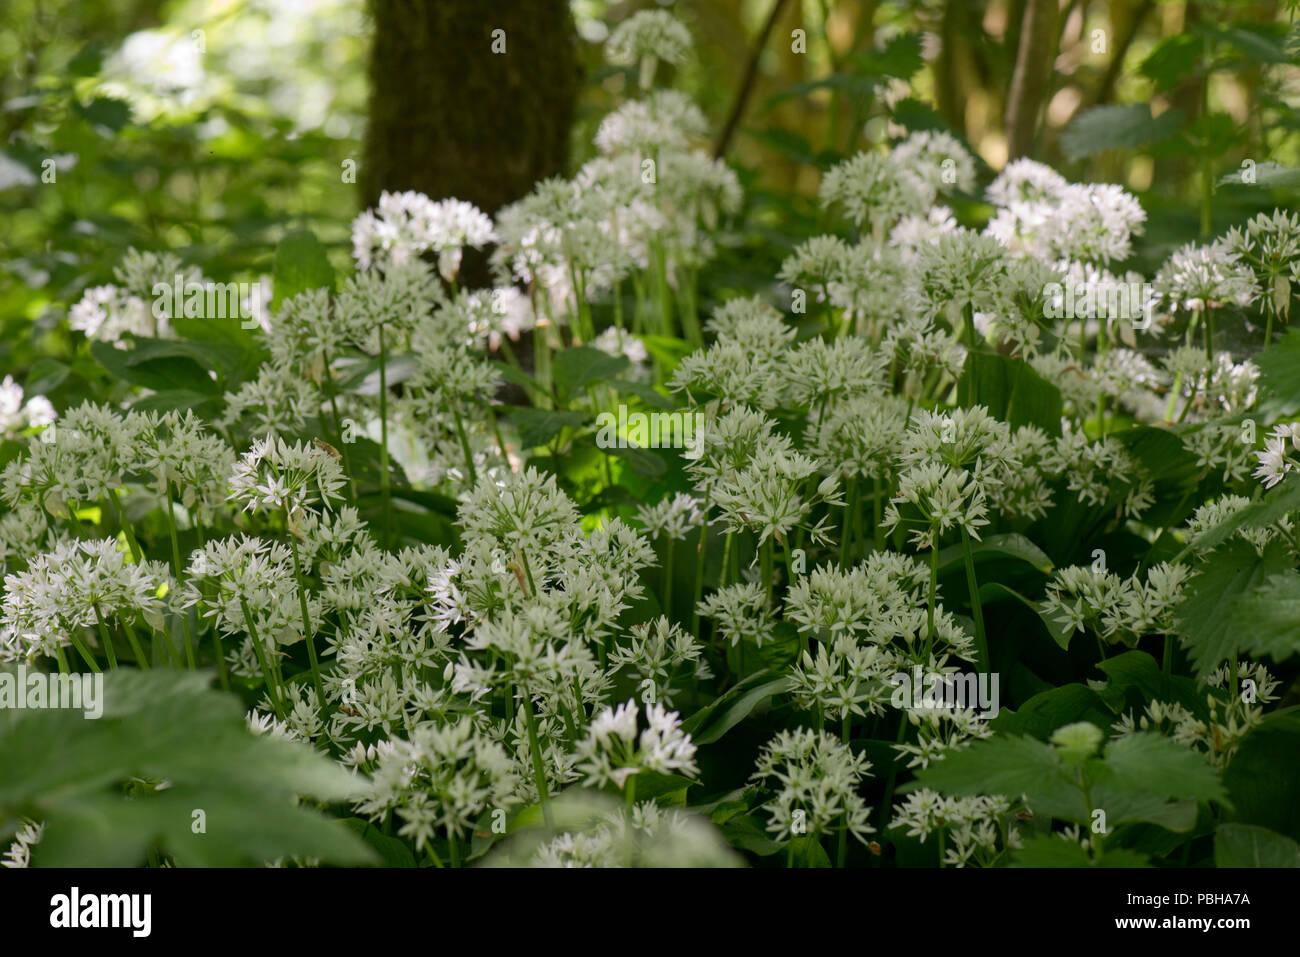 Wild garlic or ramsons, Allium ursinum, white flowers in dappled woodland shade in spring, Berkshire, May - Stock Image